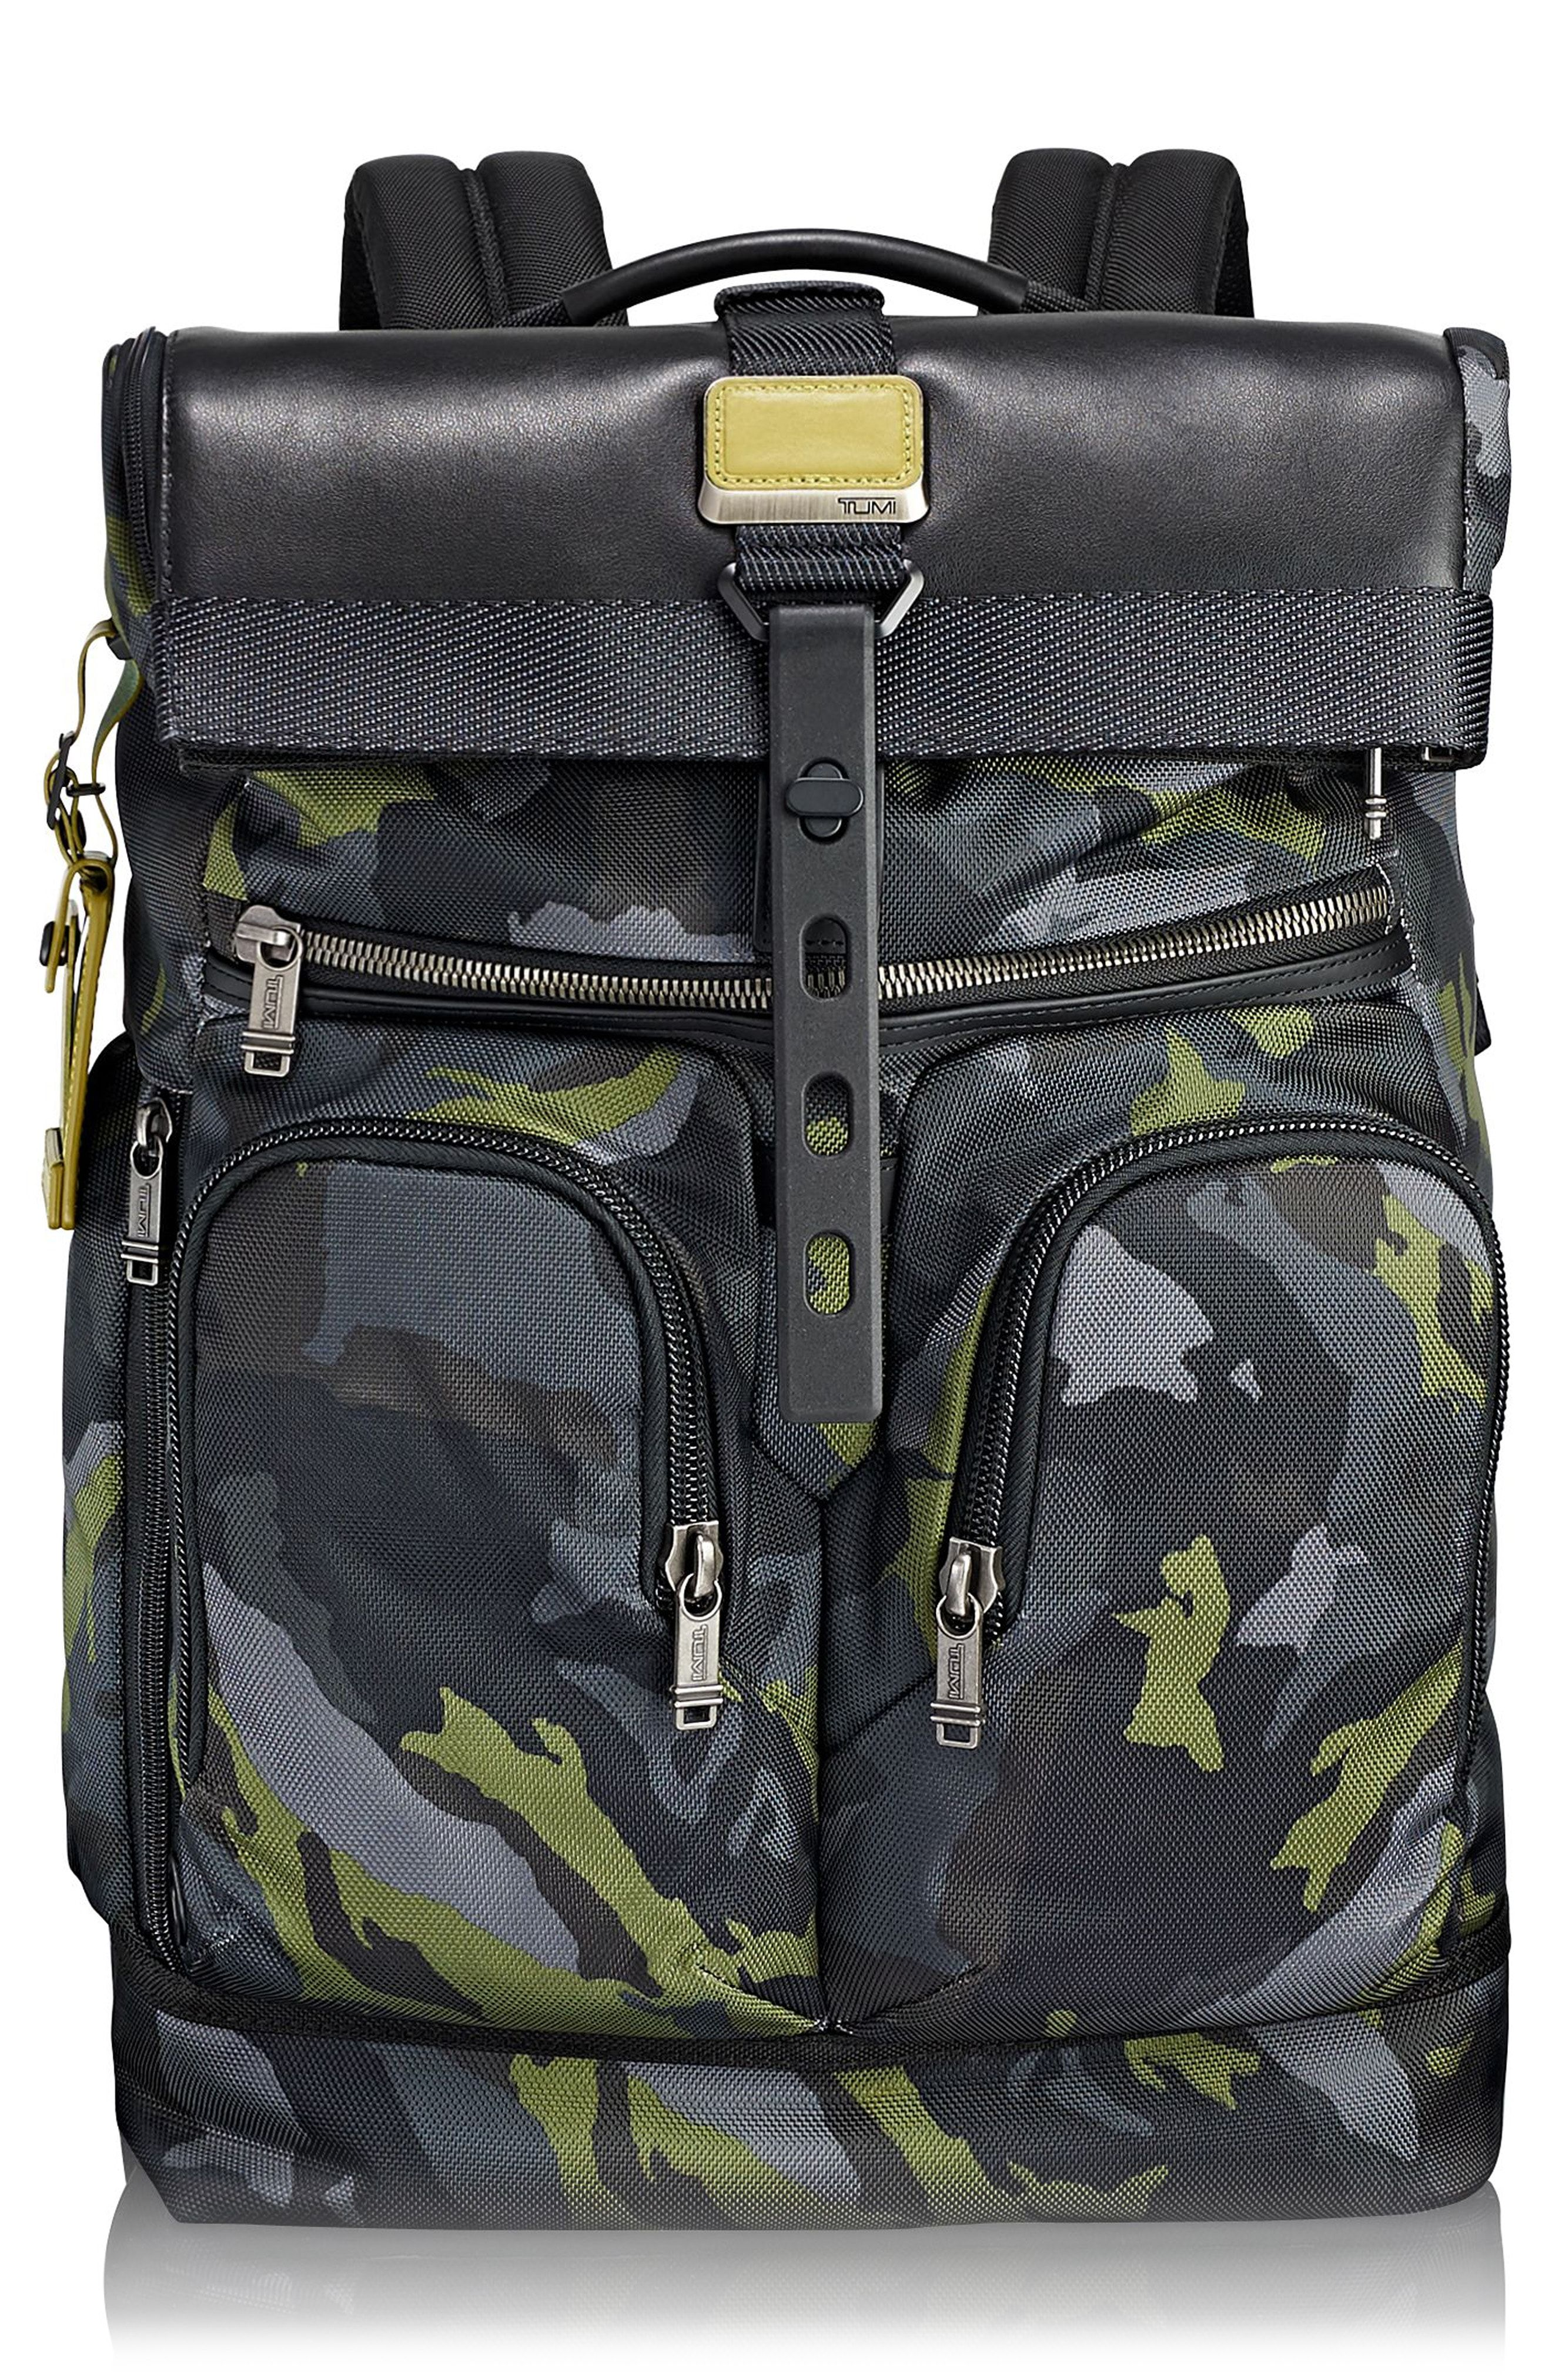 cef98d51e649 TUMI ALPHA BRAVO - LONDON BACKPACK - GREEN.  tumi  bags  leather  nylon   backpacks